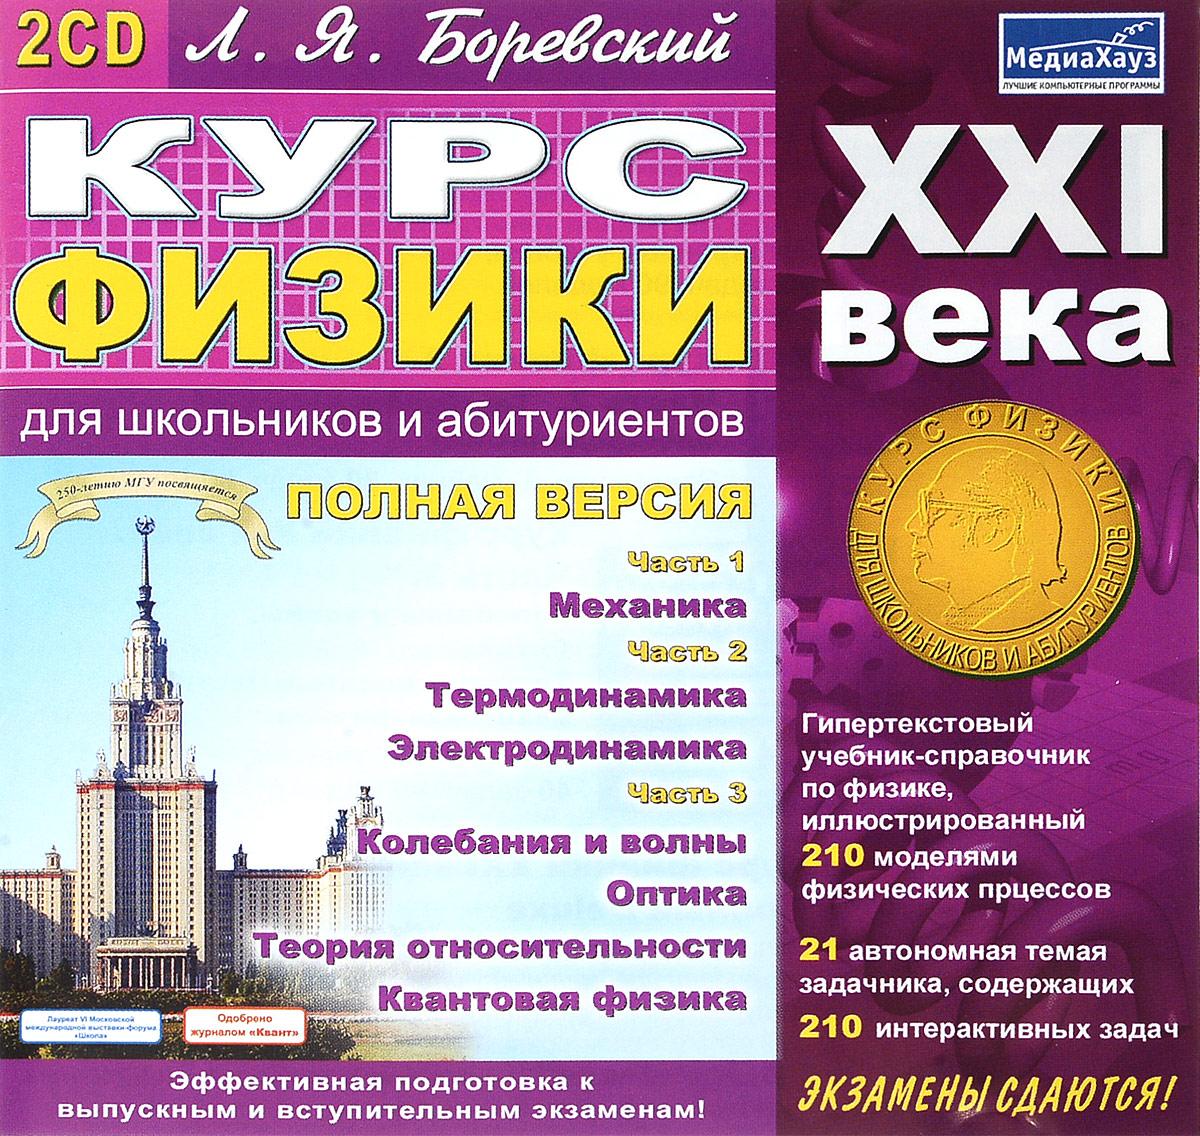 Л.Я. Боревский. Курс физики XXI века. Полная версия (2 CD)